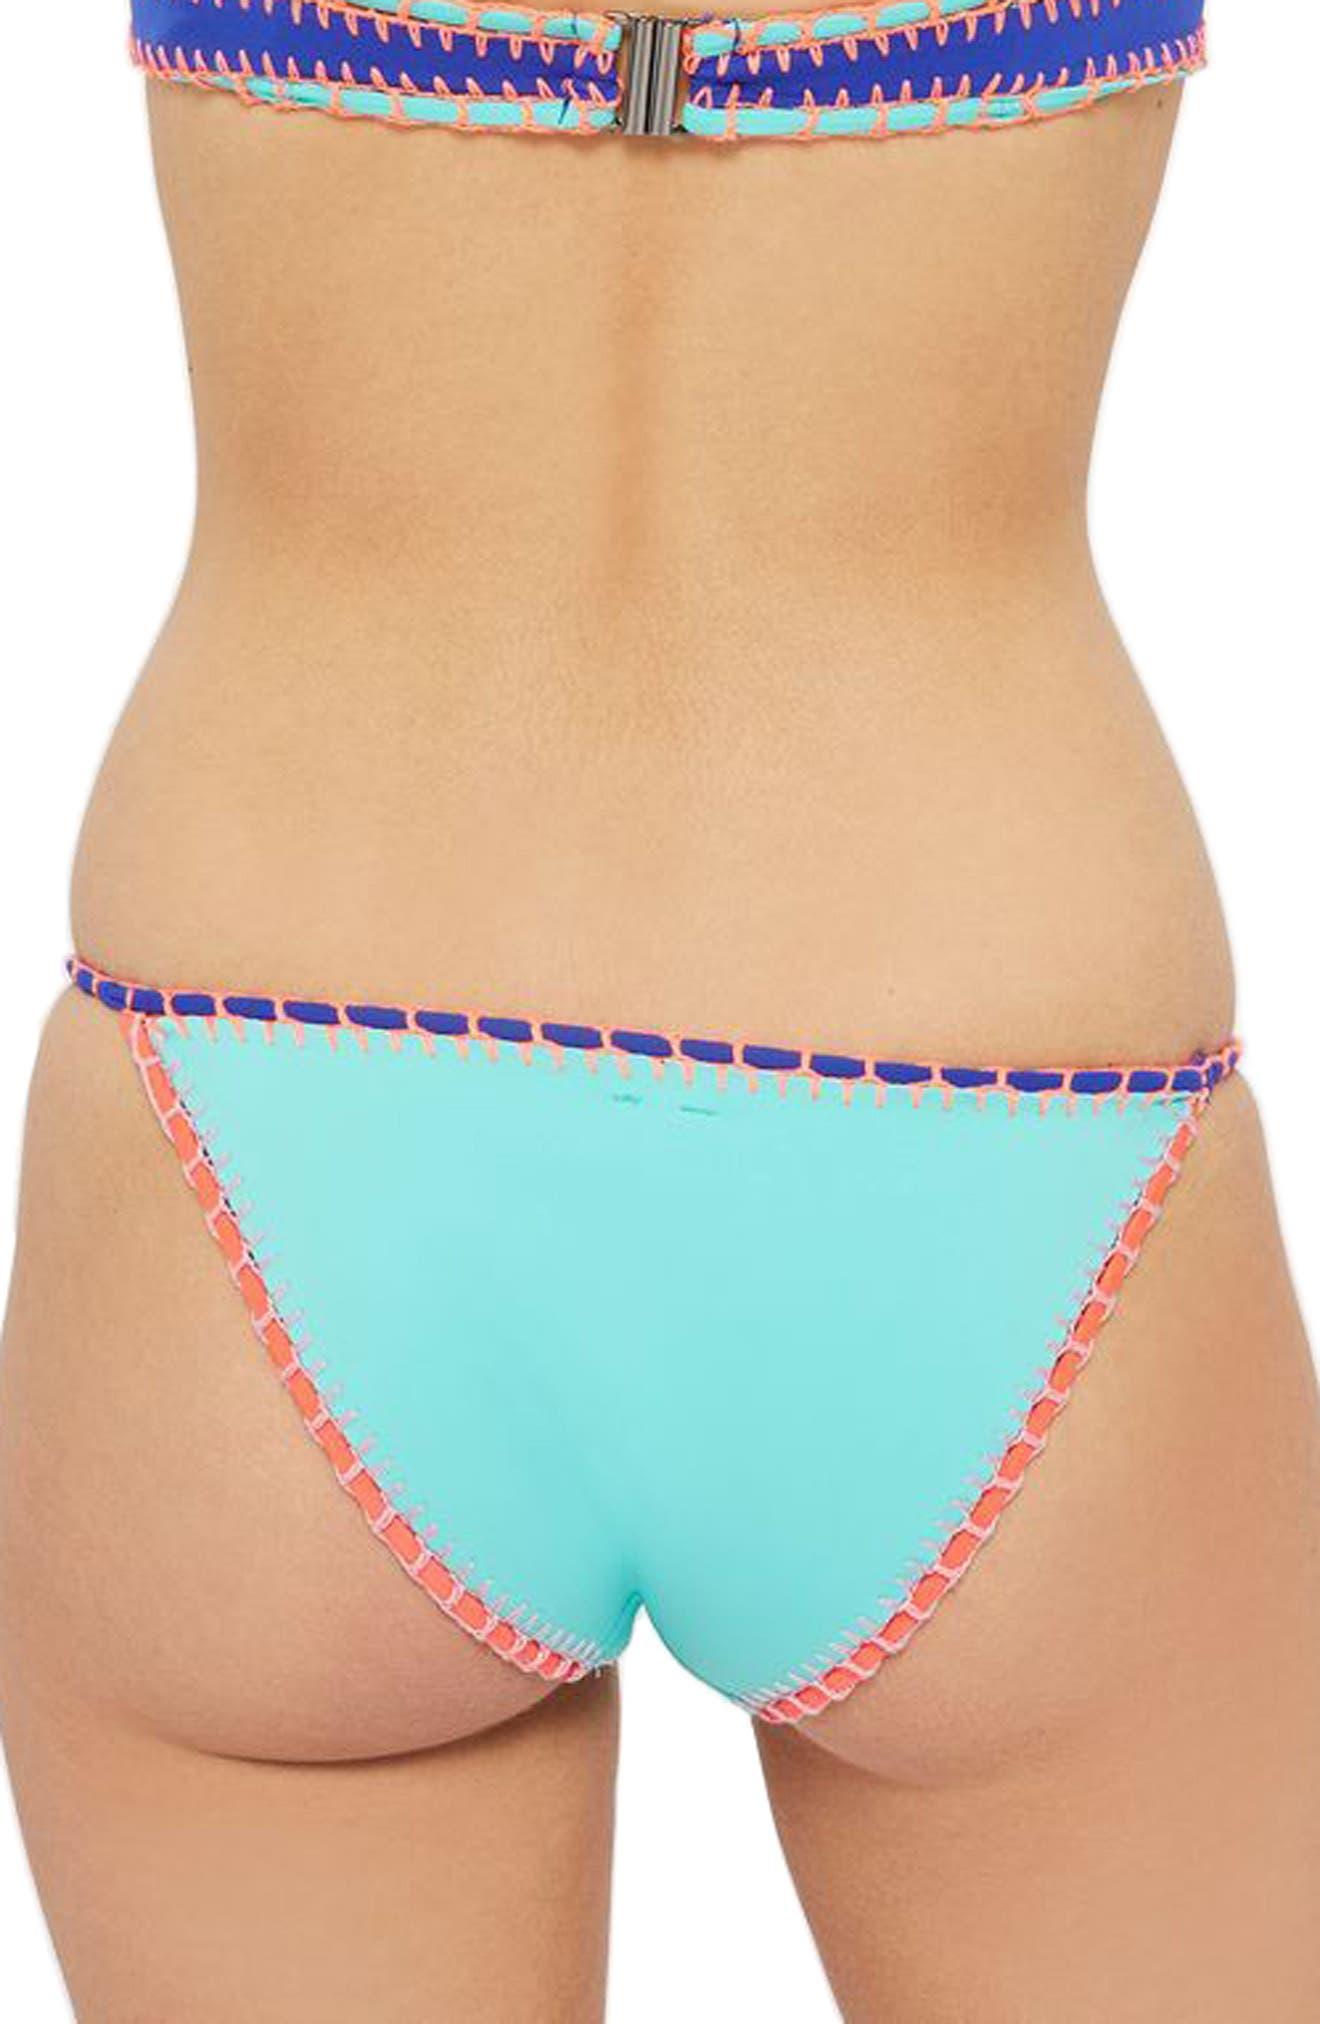 TOPSHOP, Embroidered Crochet Bikini Bottoms, Alternate thumbnail 2, color, 400